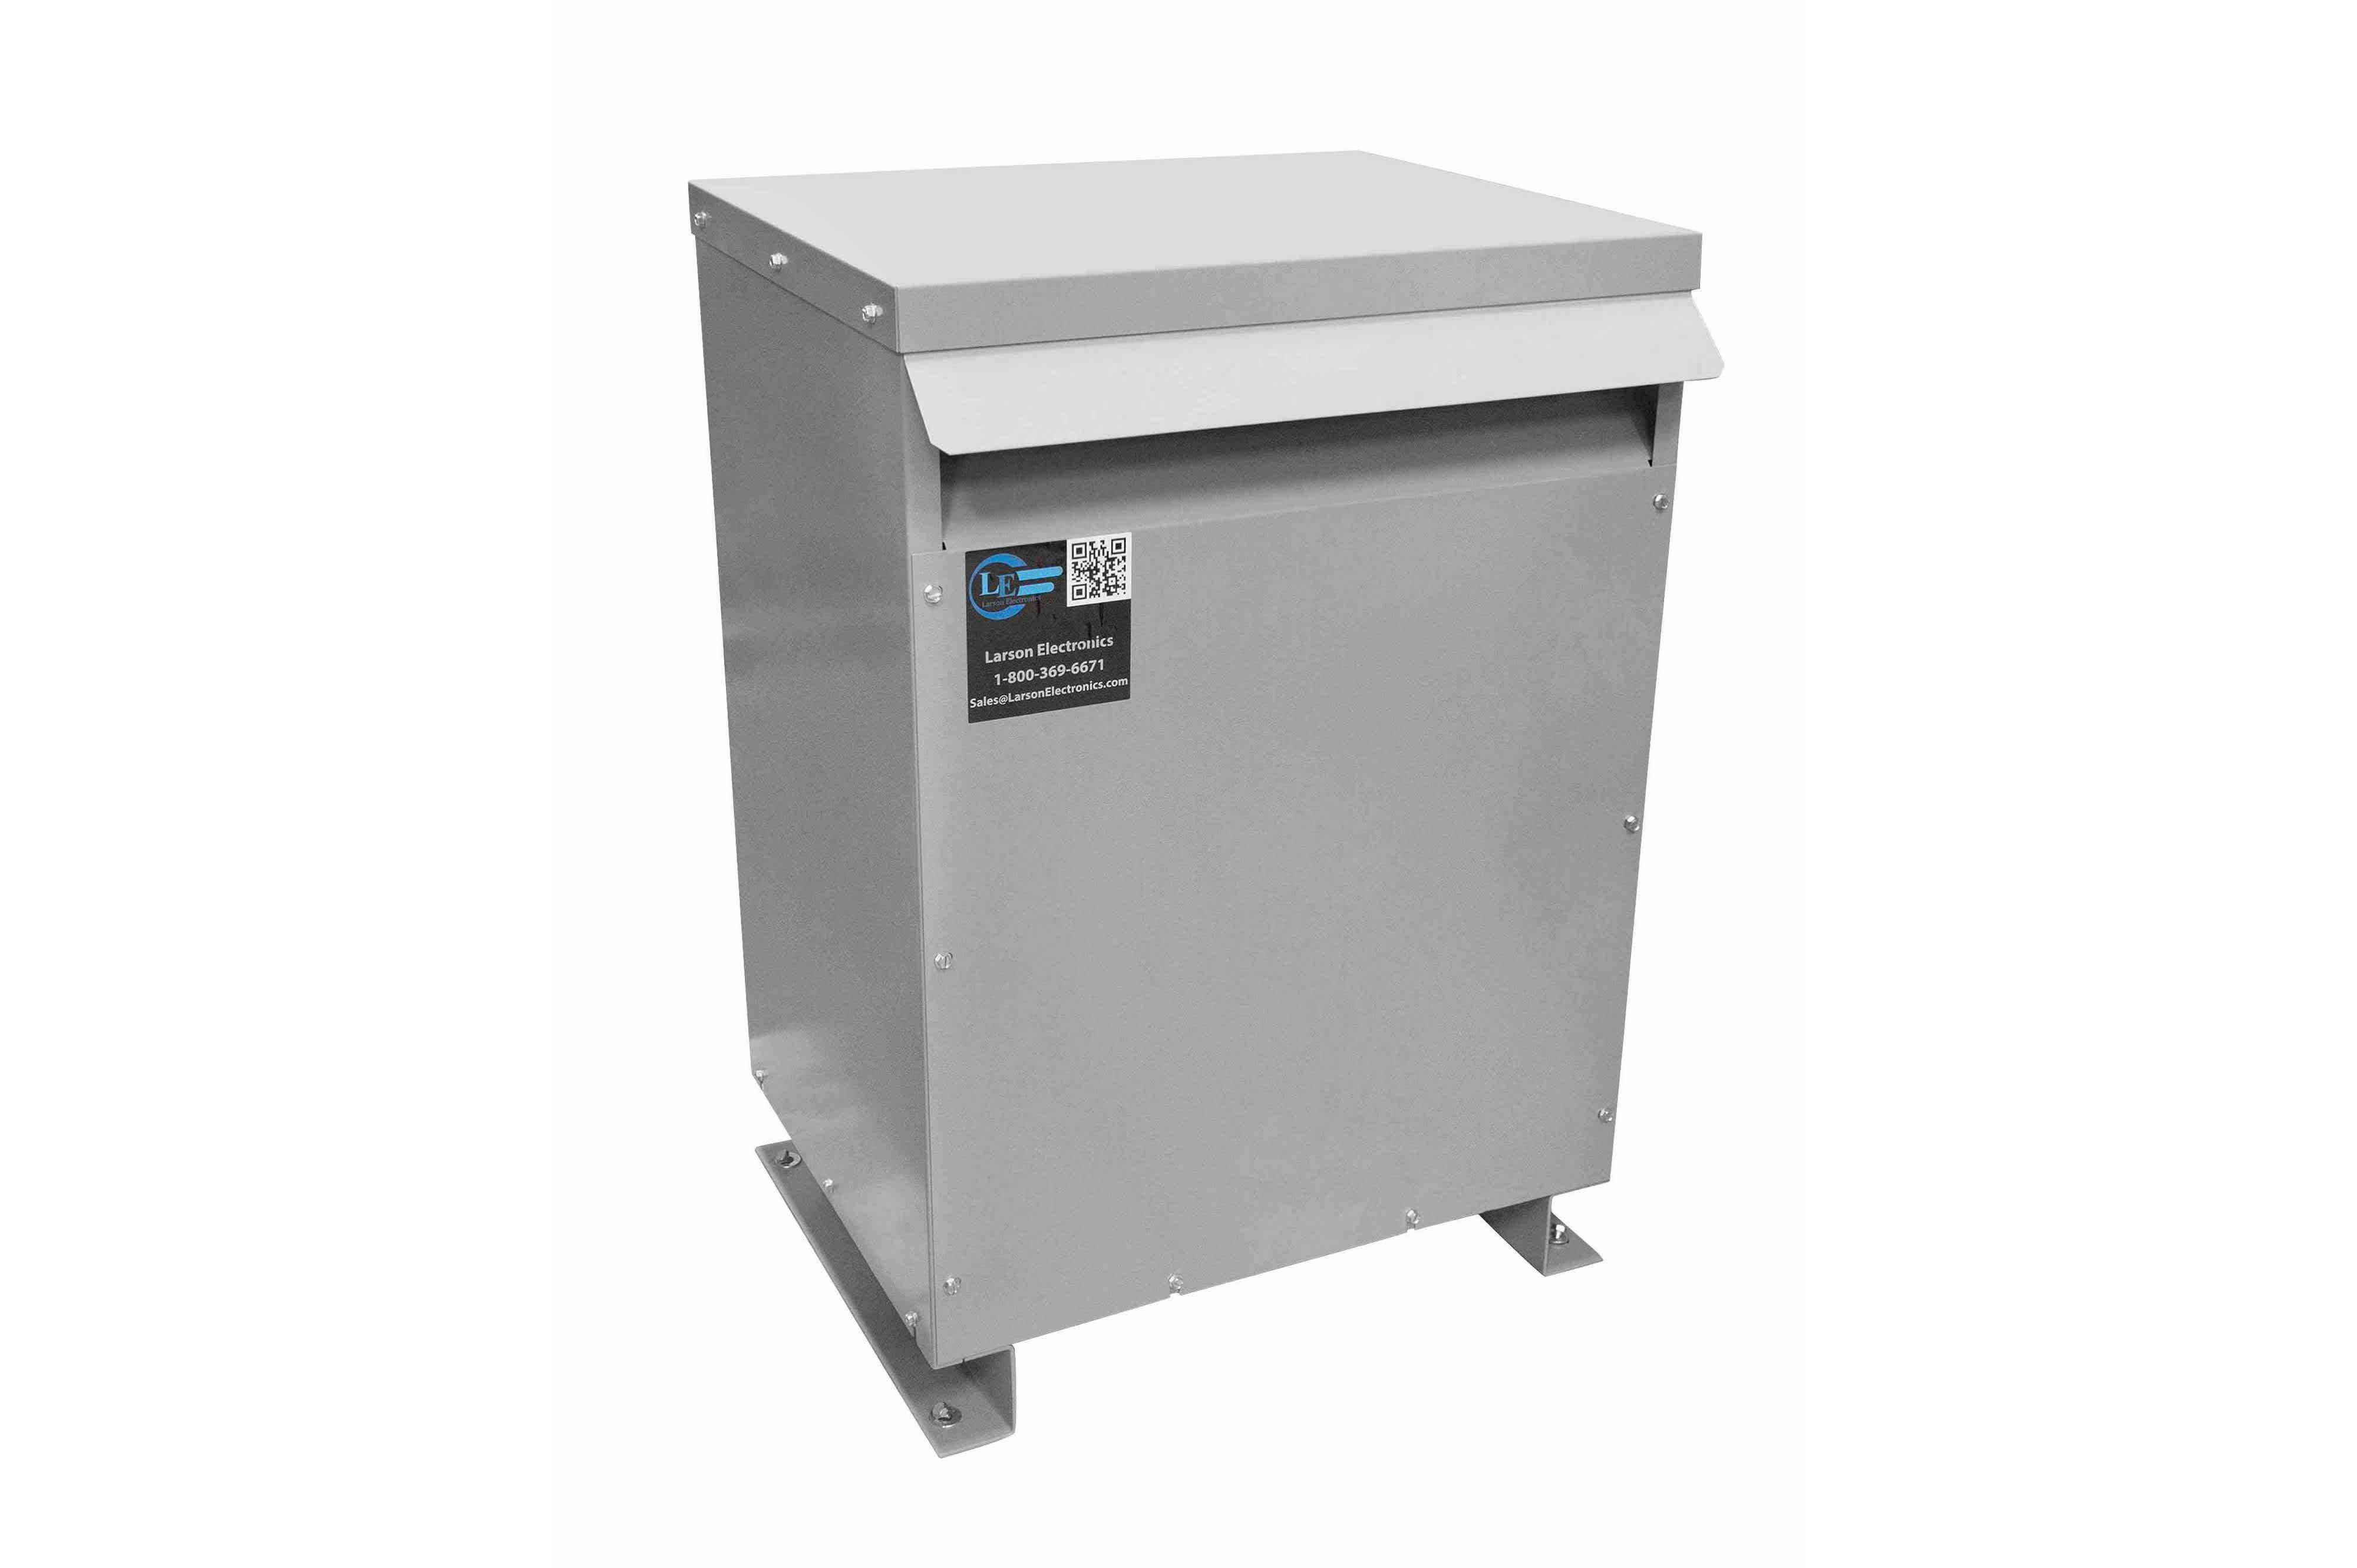 40 kVA 3PH DOE Transformer, 400V Delta Primary, 208Y/120 Wye-N Secondary, N3R, Ventilated, 60 Hz